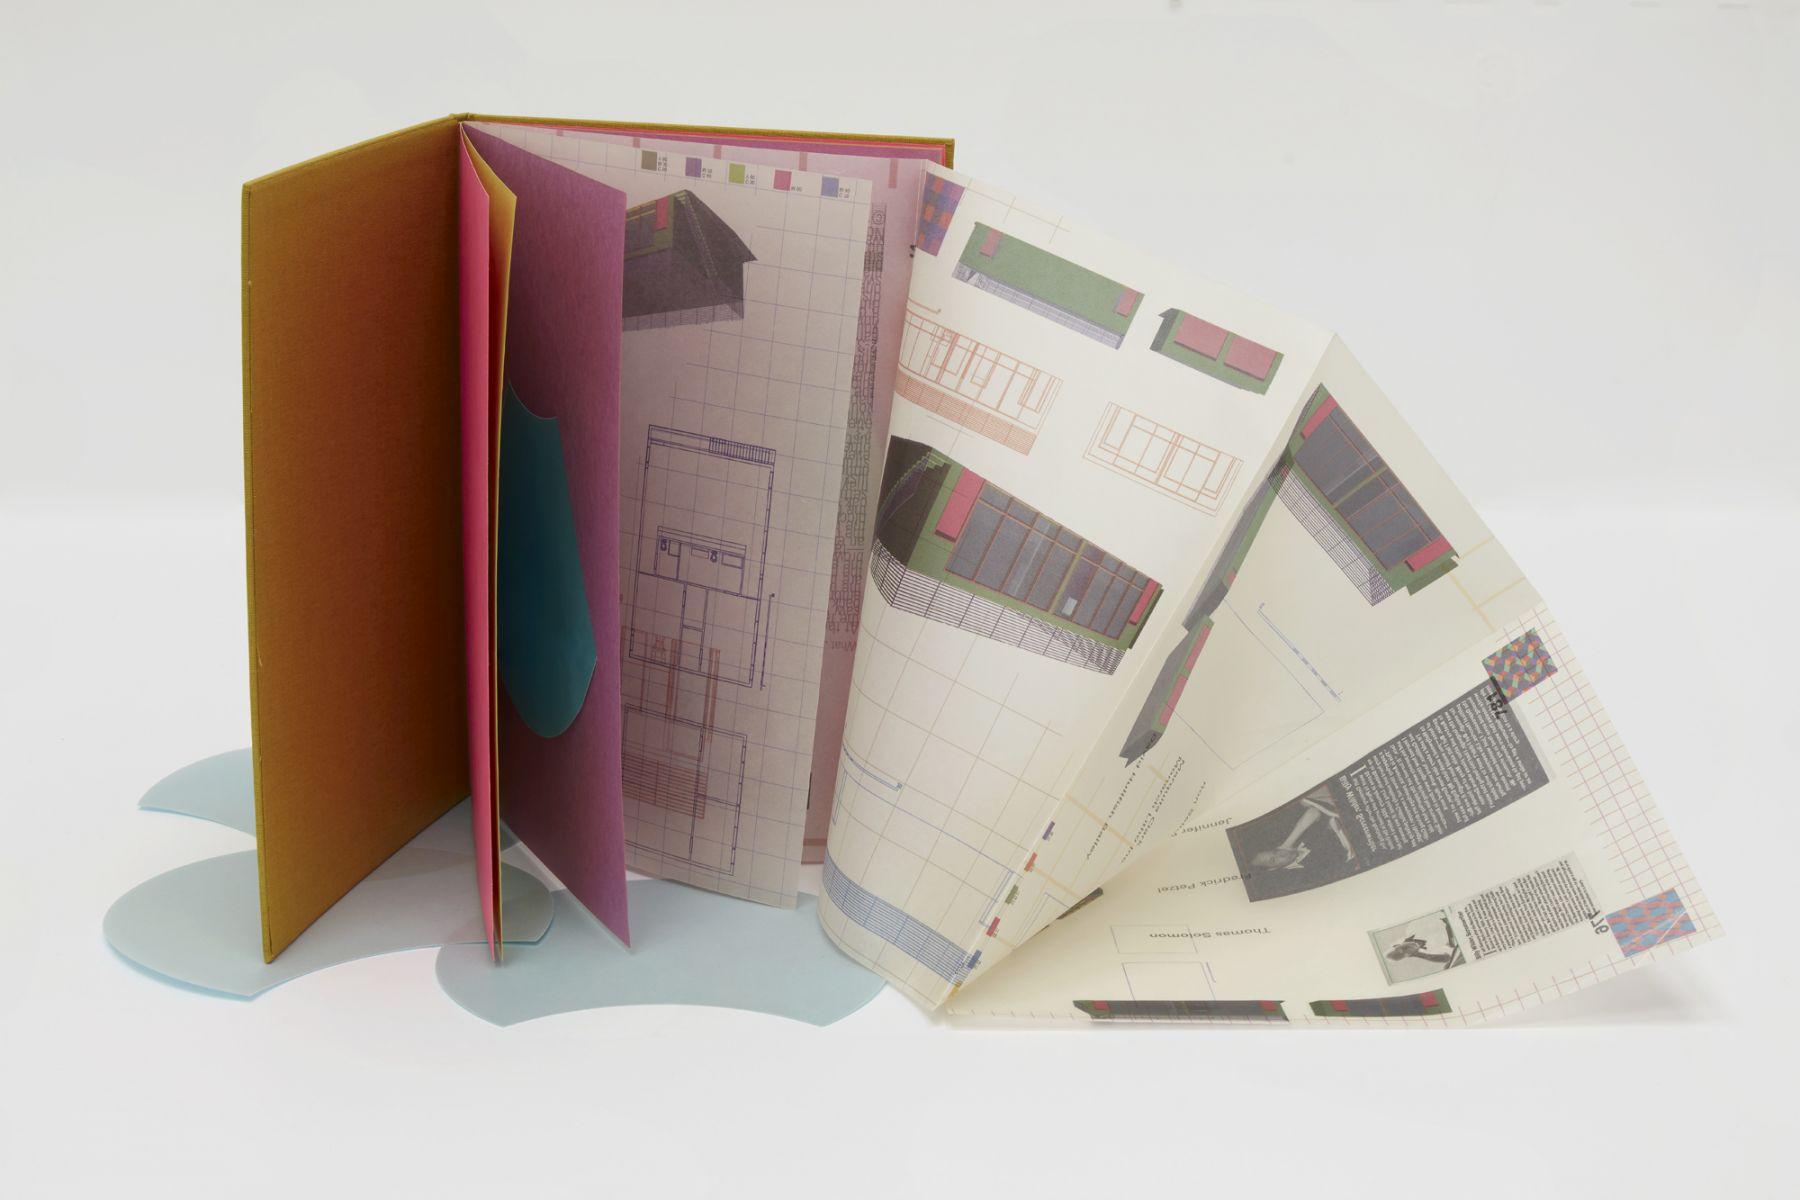 Jorge Pardo, Ten People Ten Books